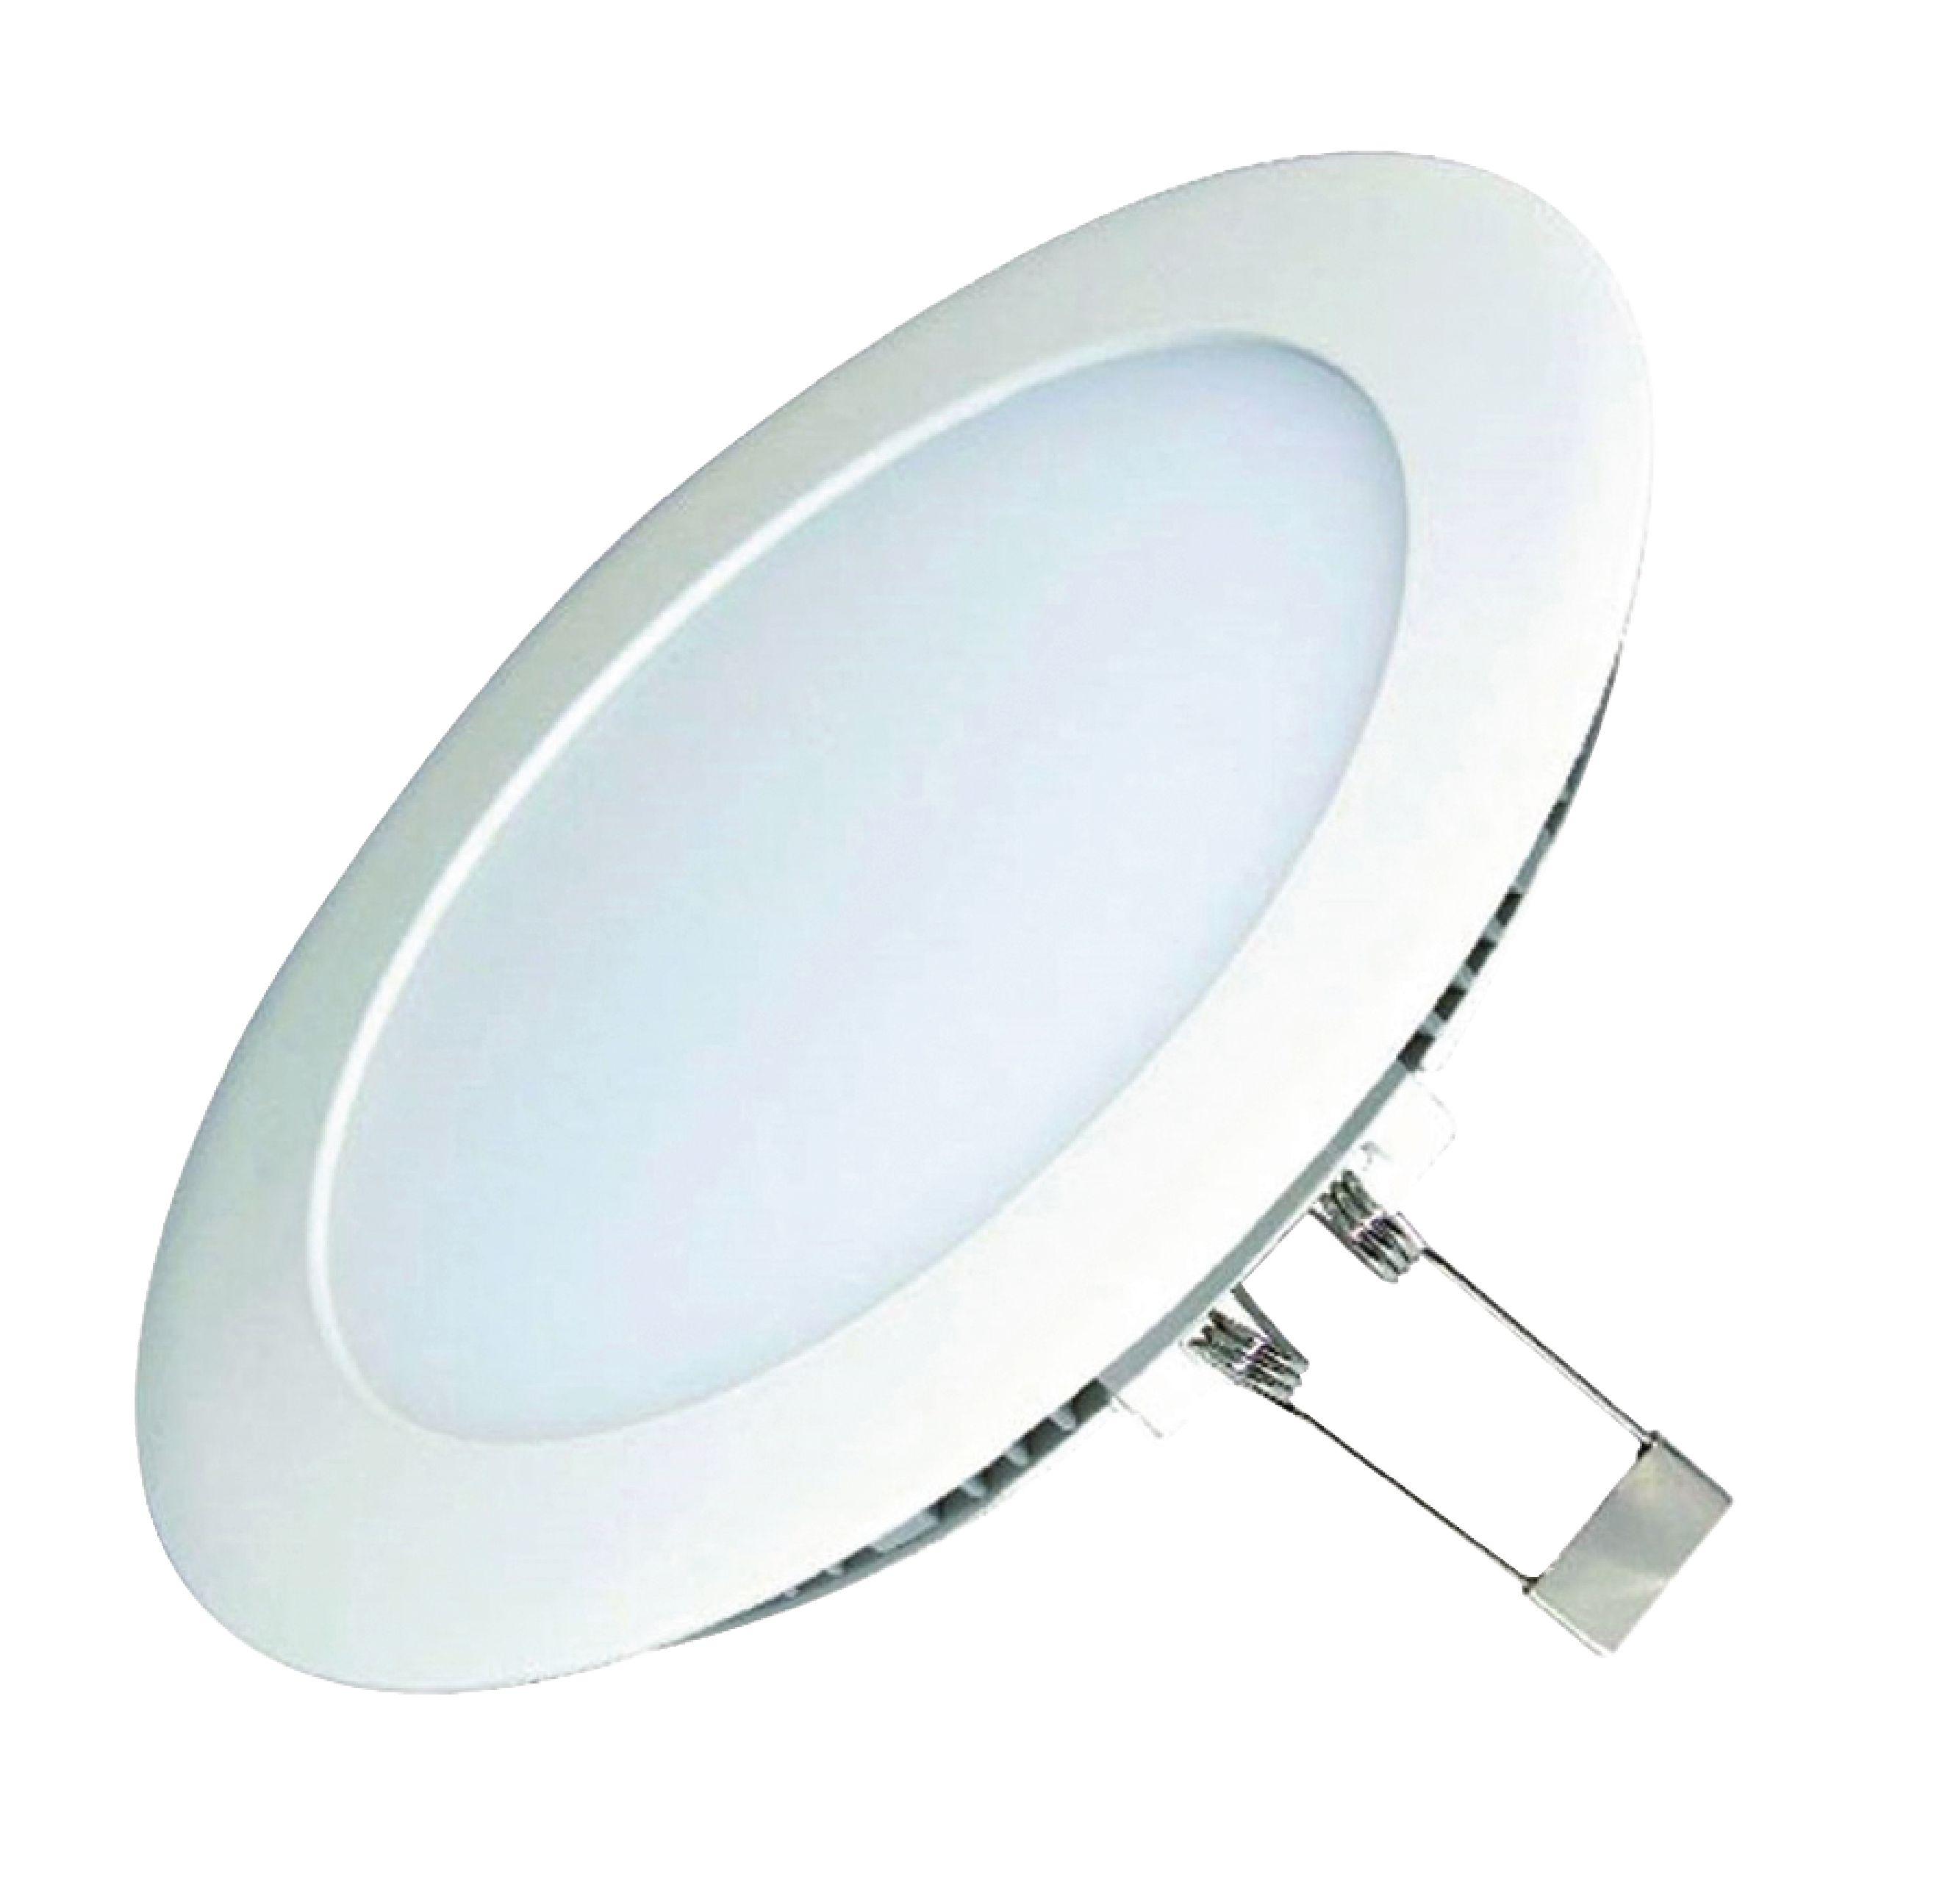 LED-Panel Rund 18 W 1270 lm 3000 K